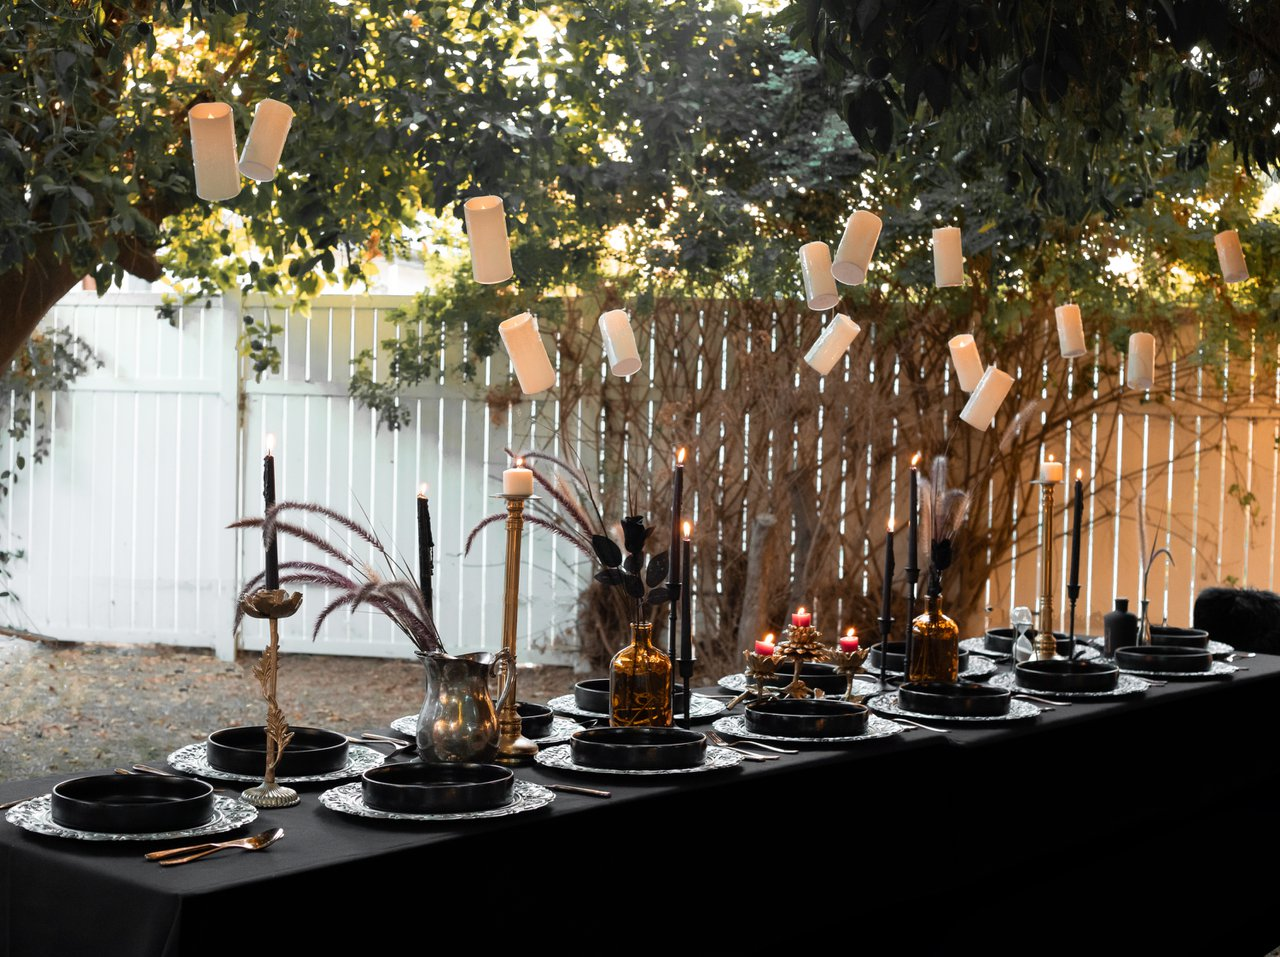 A Witchy Dinner photo D4ECADA8-E7D4-4DA2-BA5D-D1E04D8126A6.jpg